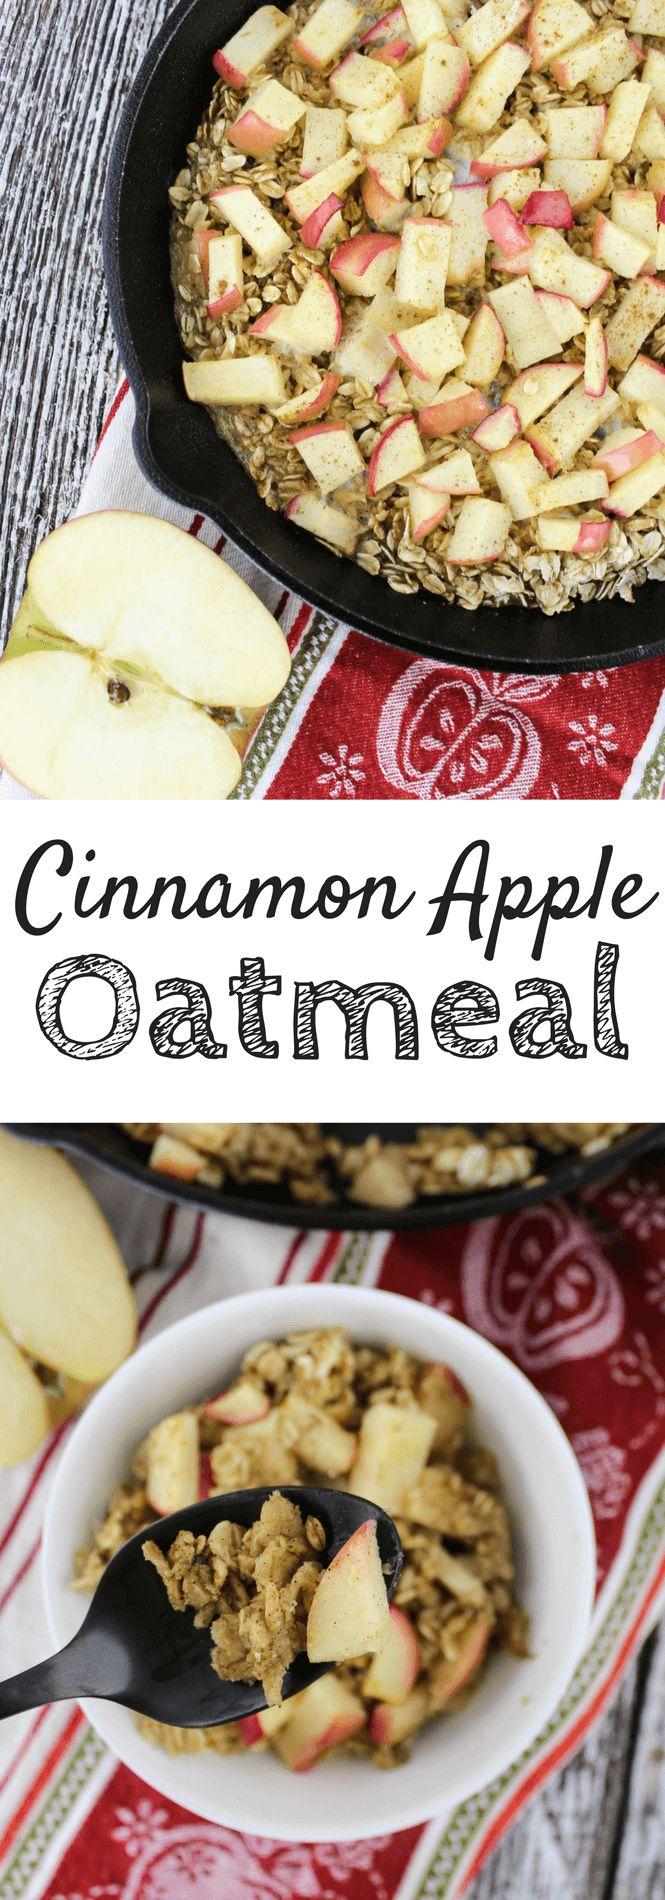 Cinnamon Apple Oatmeal Bake #breakfast #oatmeal #fallrecipe